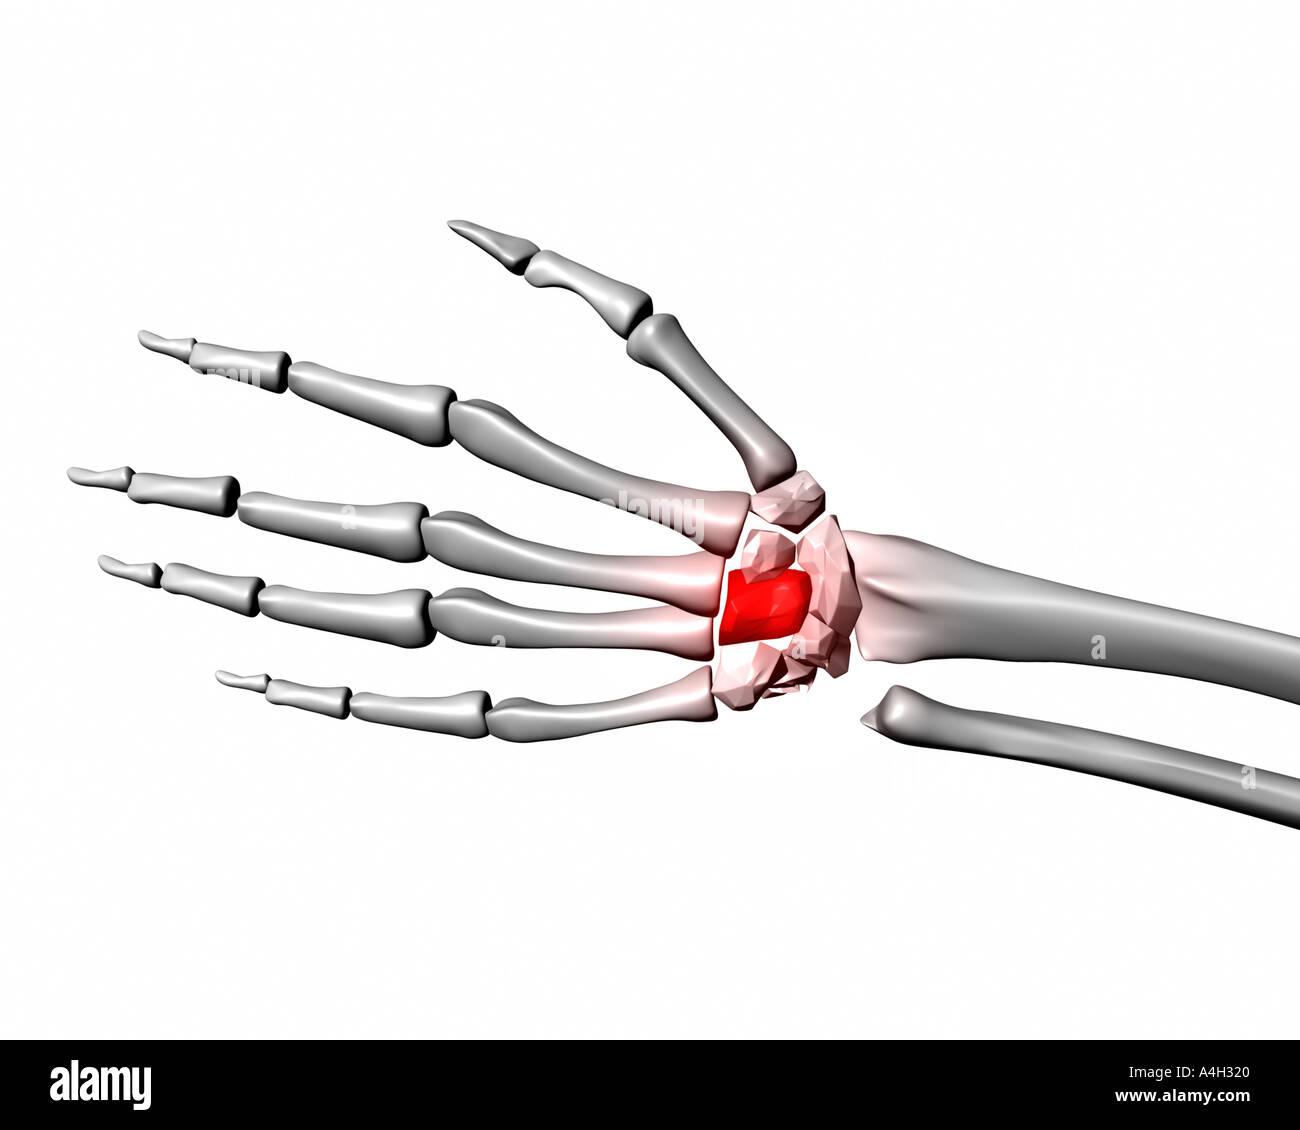 capitatum rot markiert auf menschliche Skelett hand Stockfoto, Bild ...